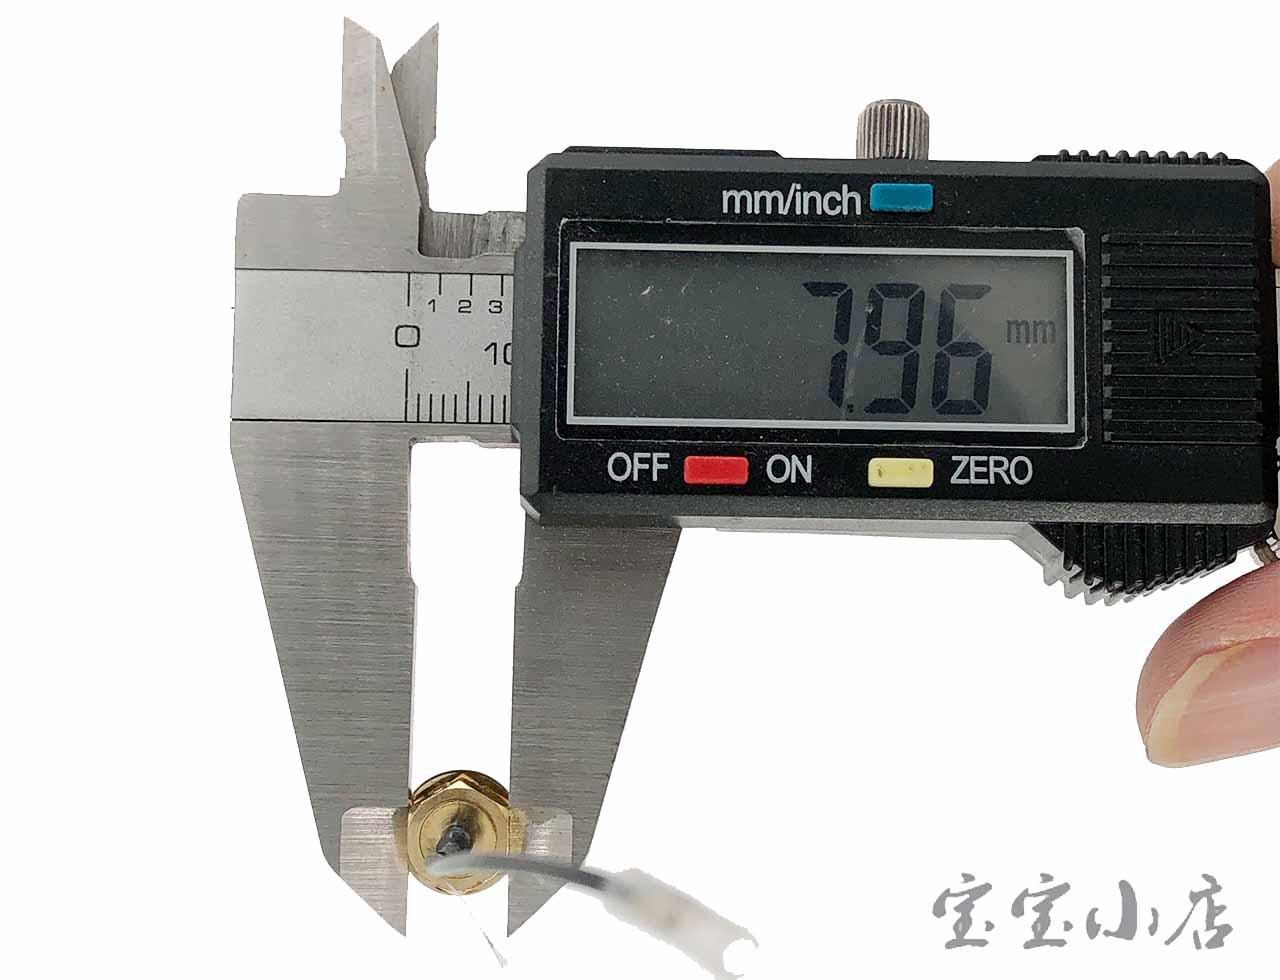 Lenovo ANTENNA LS H110 80mm nor M.2 RF Cable 2.4G fru:00XJ061高增益wifi天线配套SMA转接线模块数传全向天线IPEX 联想 TS P720 920 520工作站